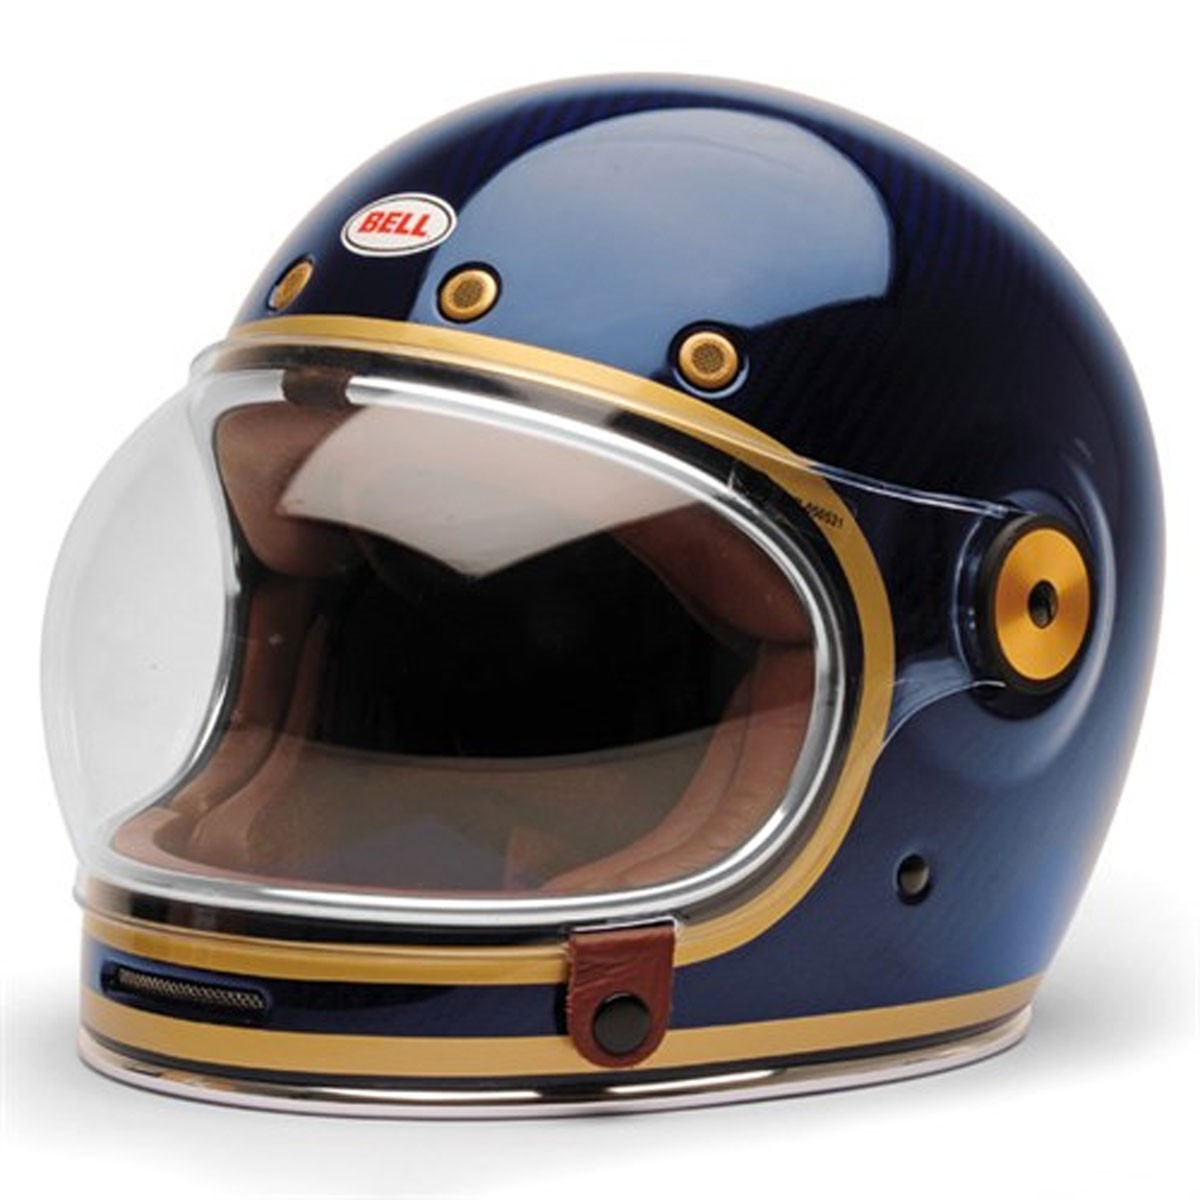 Cafe Racer Helmet